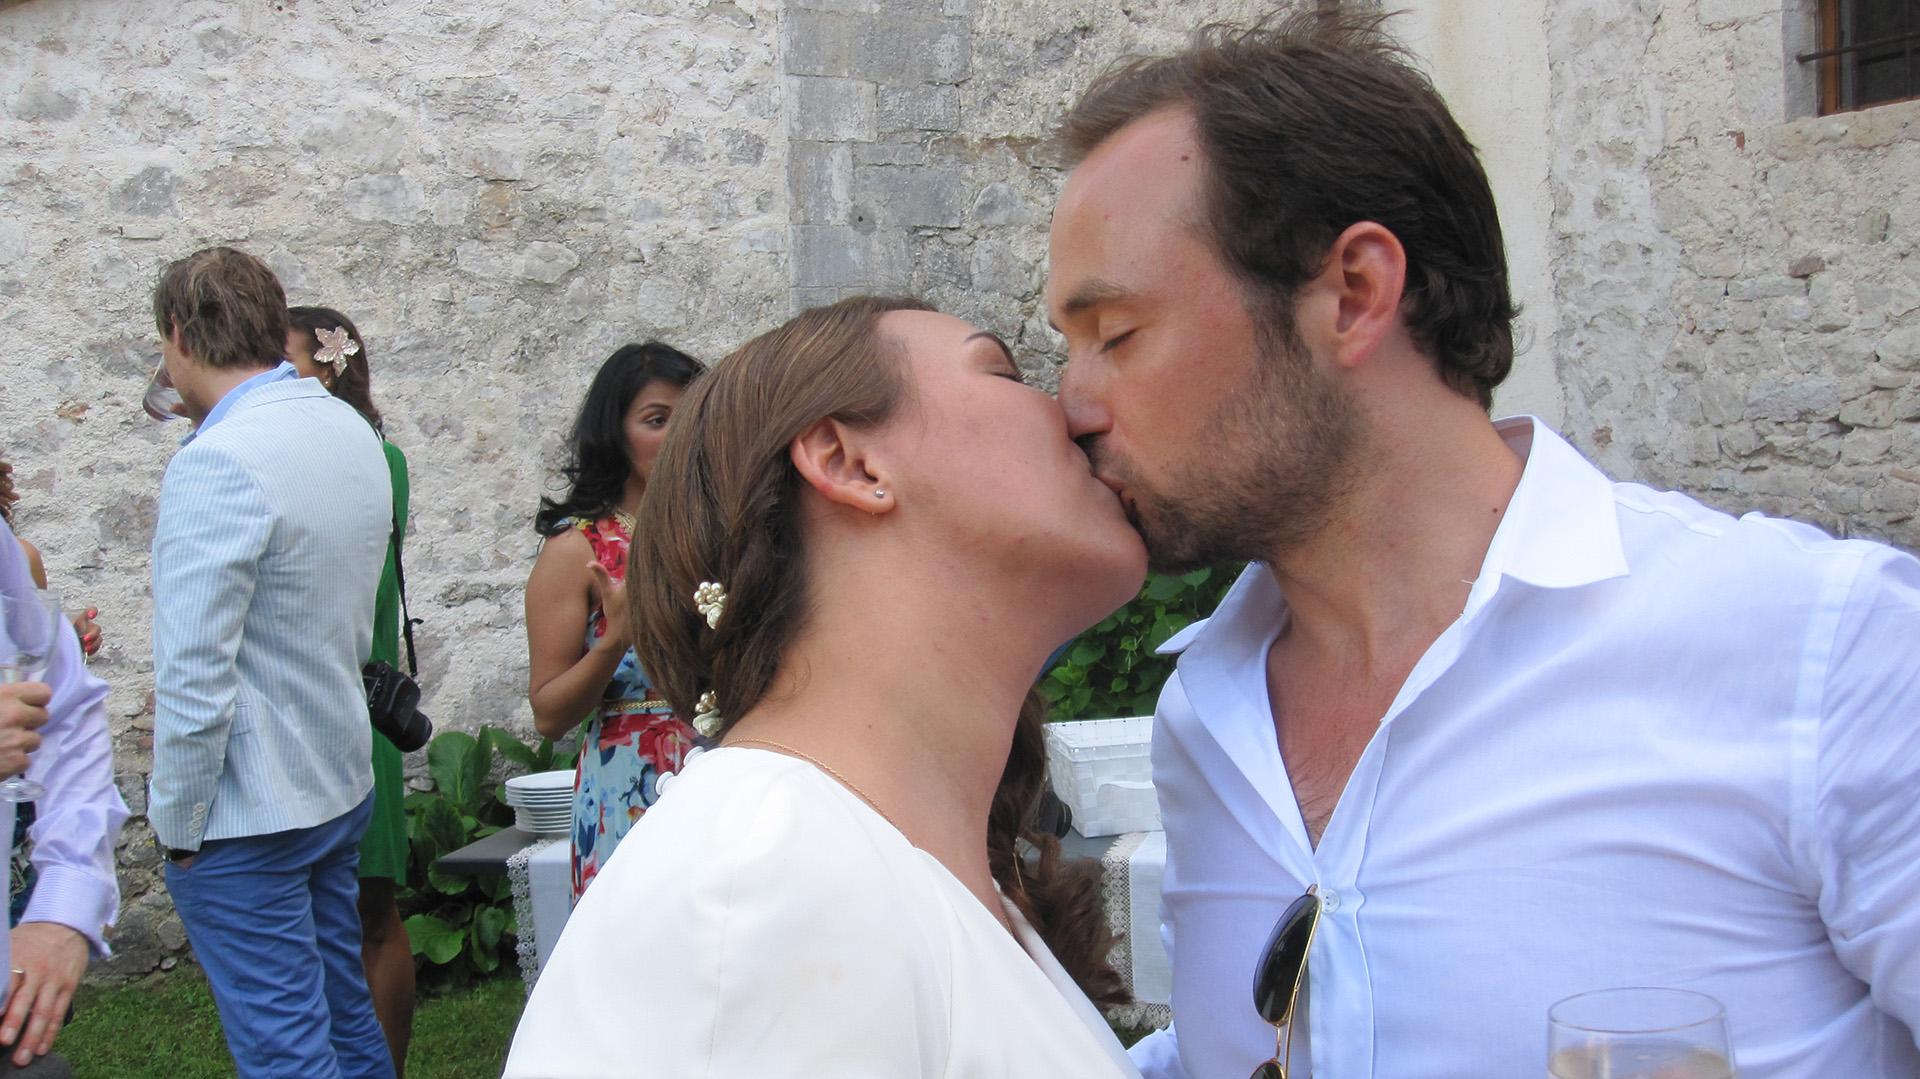 Mette og Robins bryllupsdag